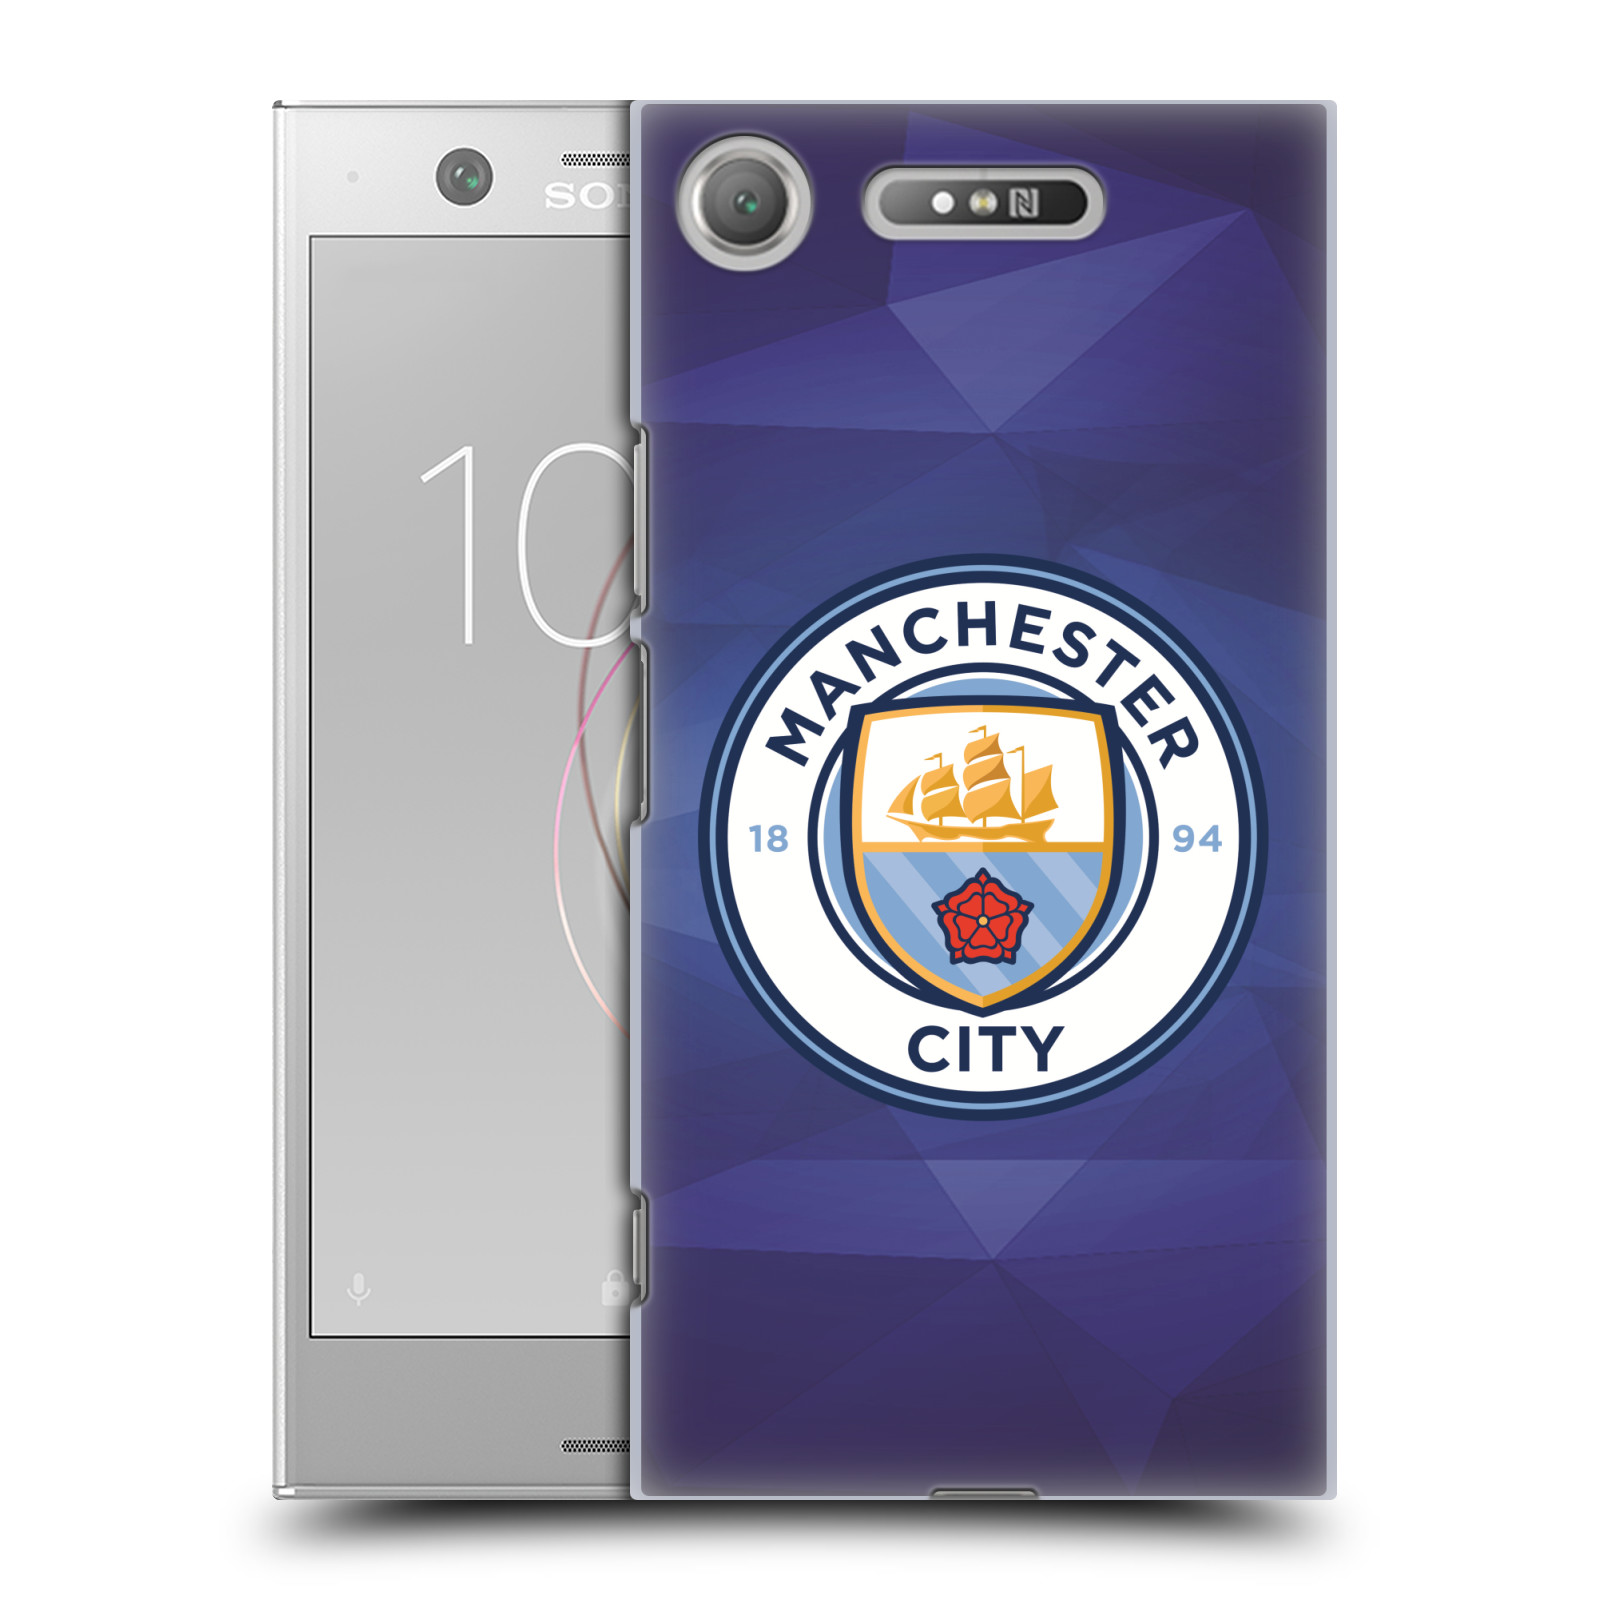 Plastové pouzdro na mobil Sony Xperia XZ1 - Head Case - Manchester City FC - Modré nové logo